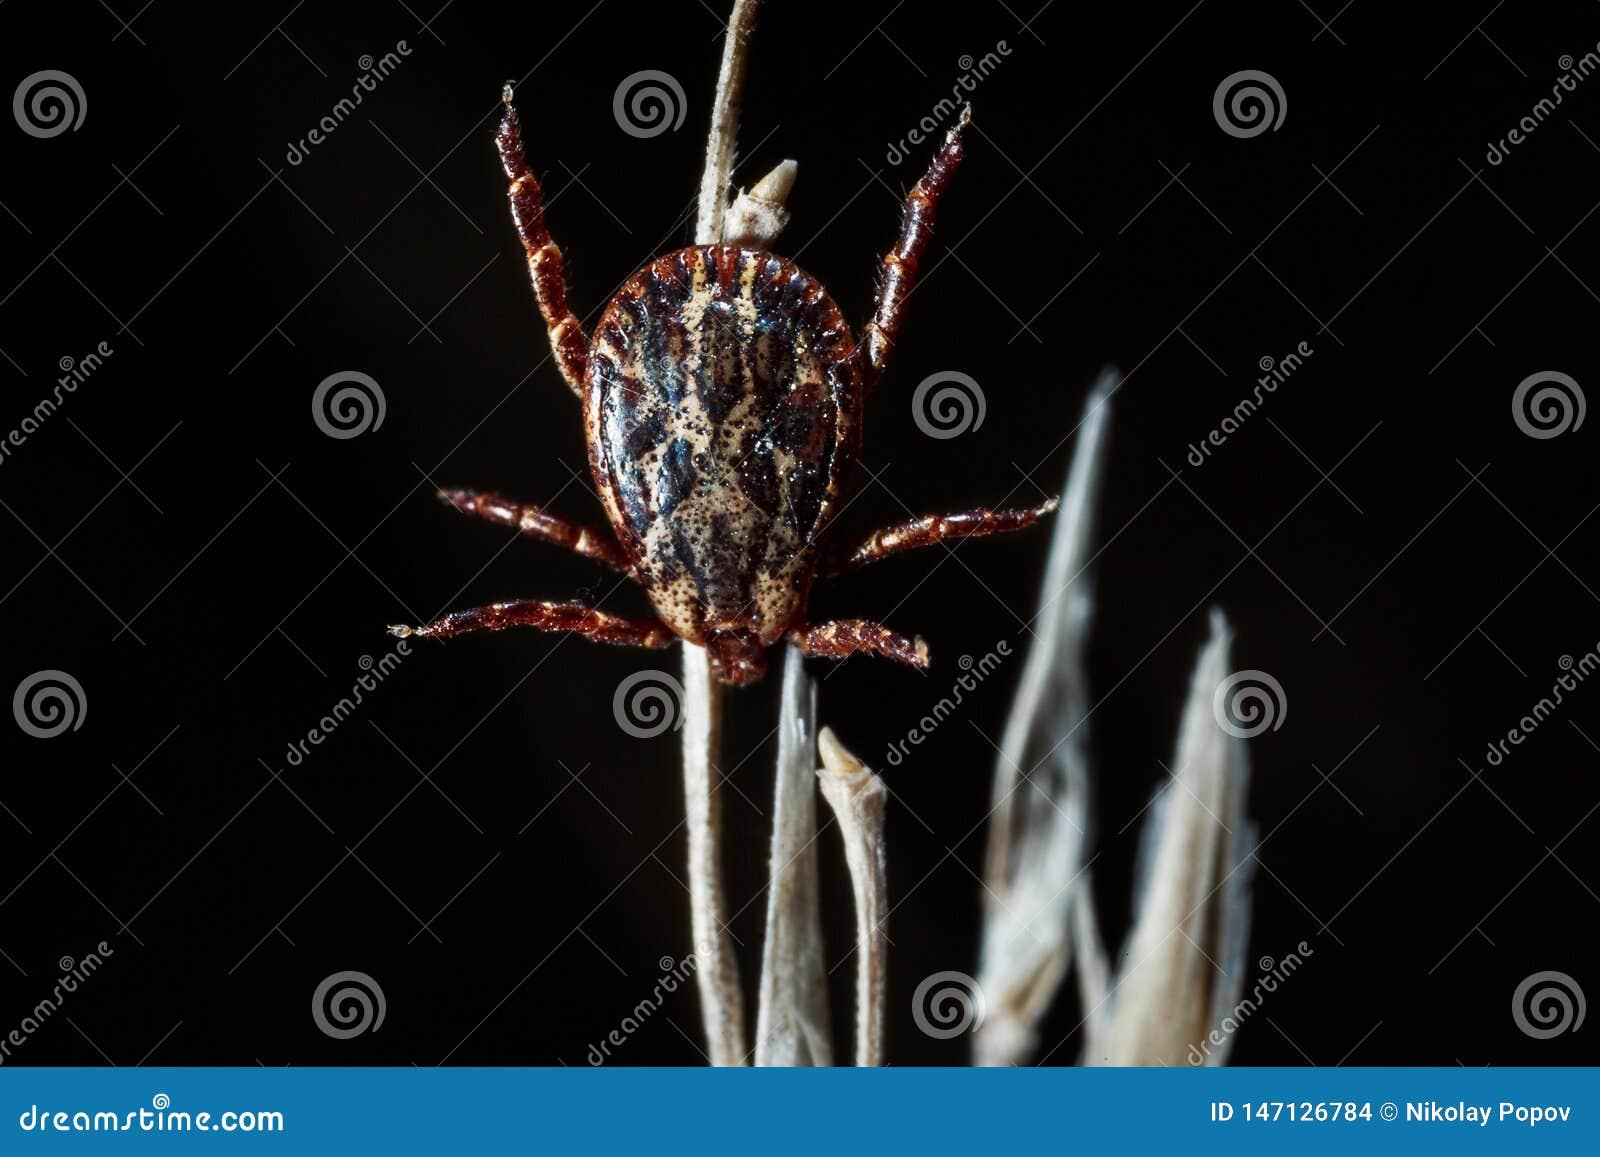 The parasite mite